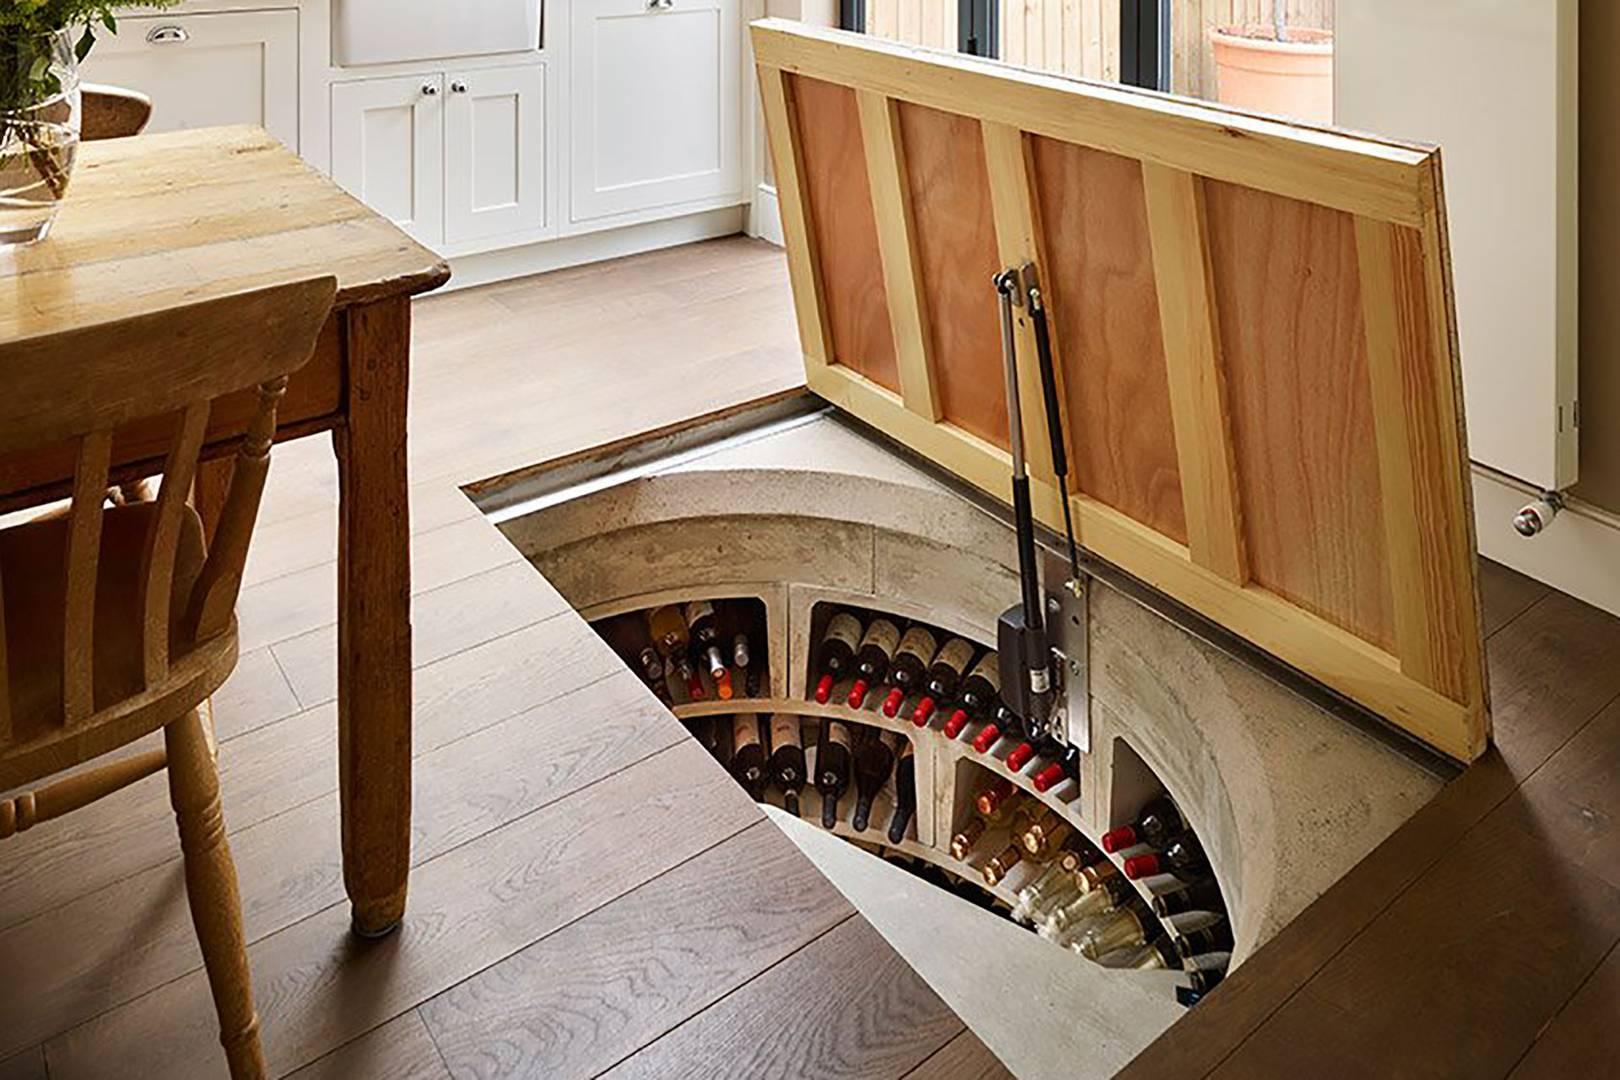 Spiral Wine Cellars Are The New Status Symbols For Super Rich Tatler